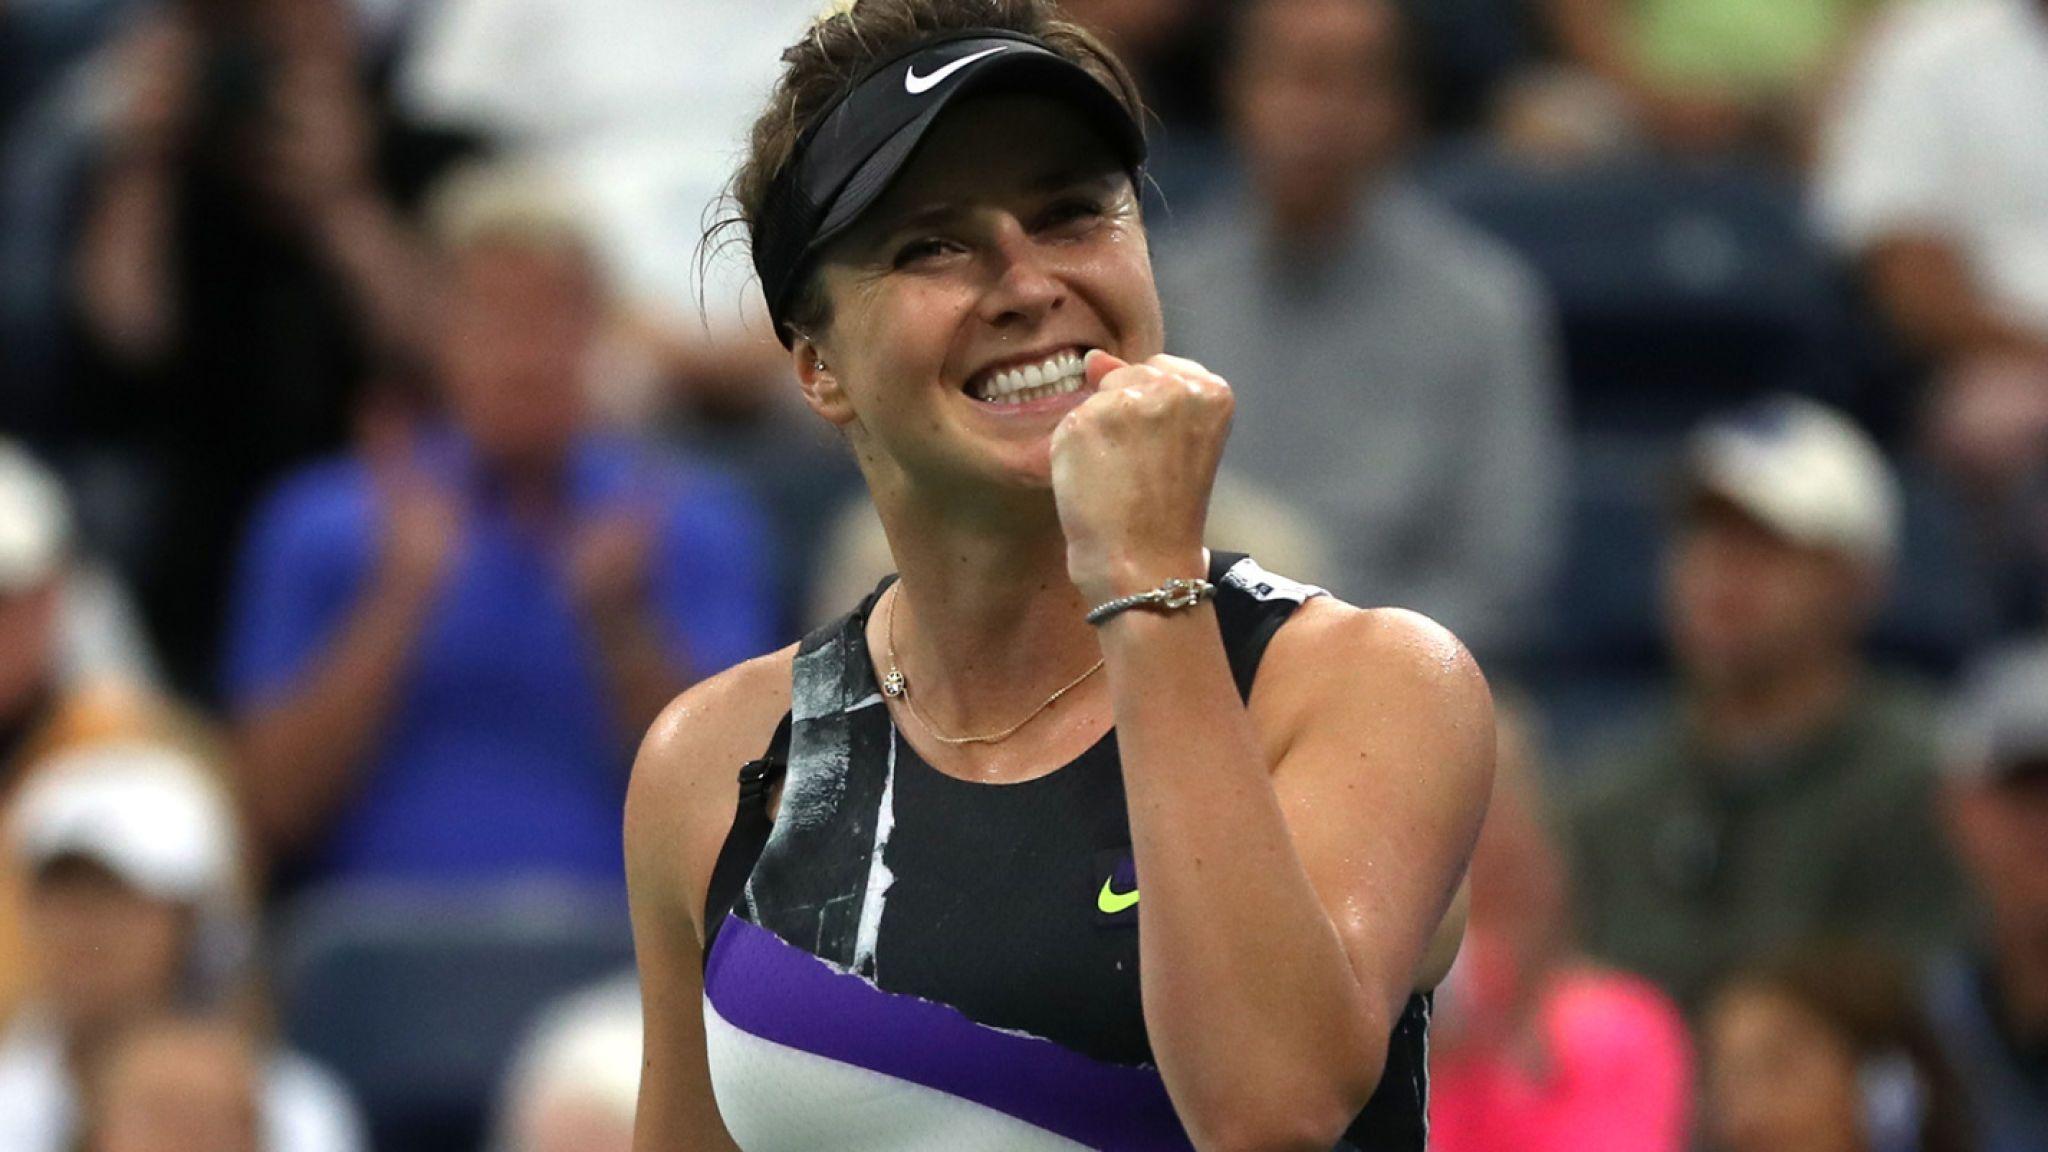 Elina Svitolina despacha Venus Williams no US Open